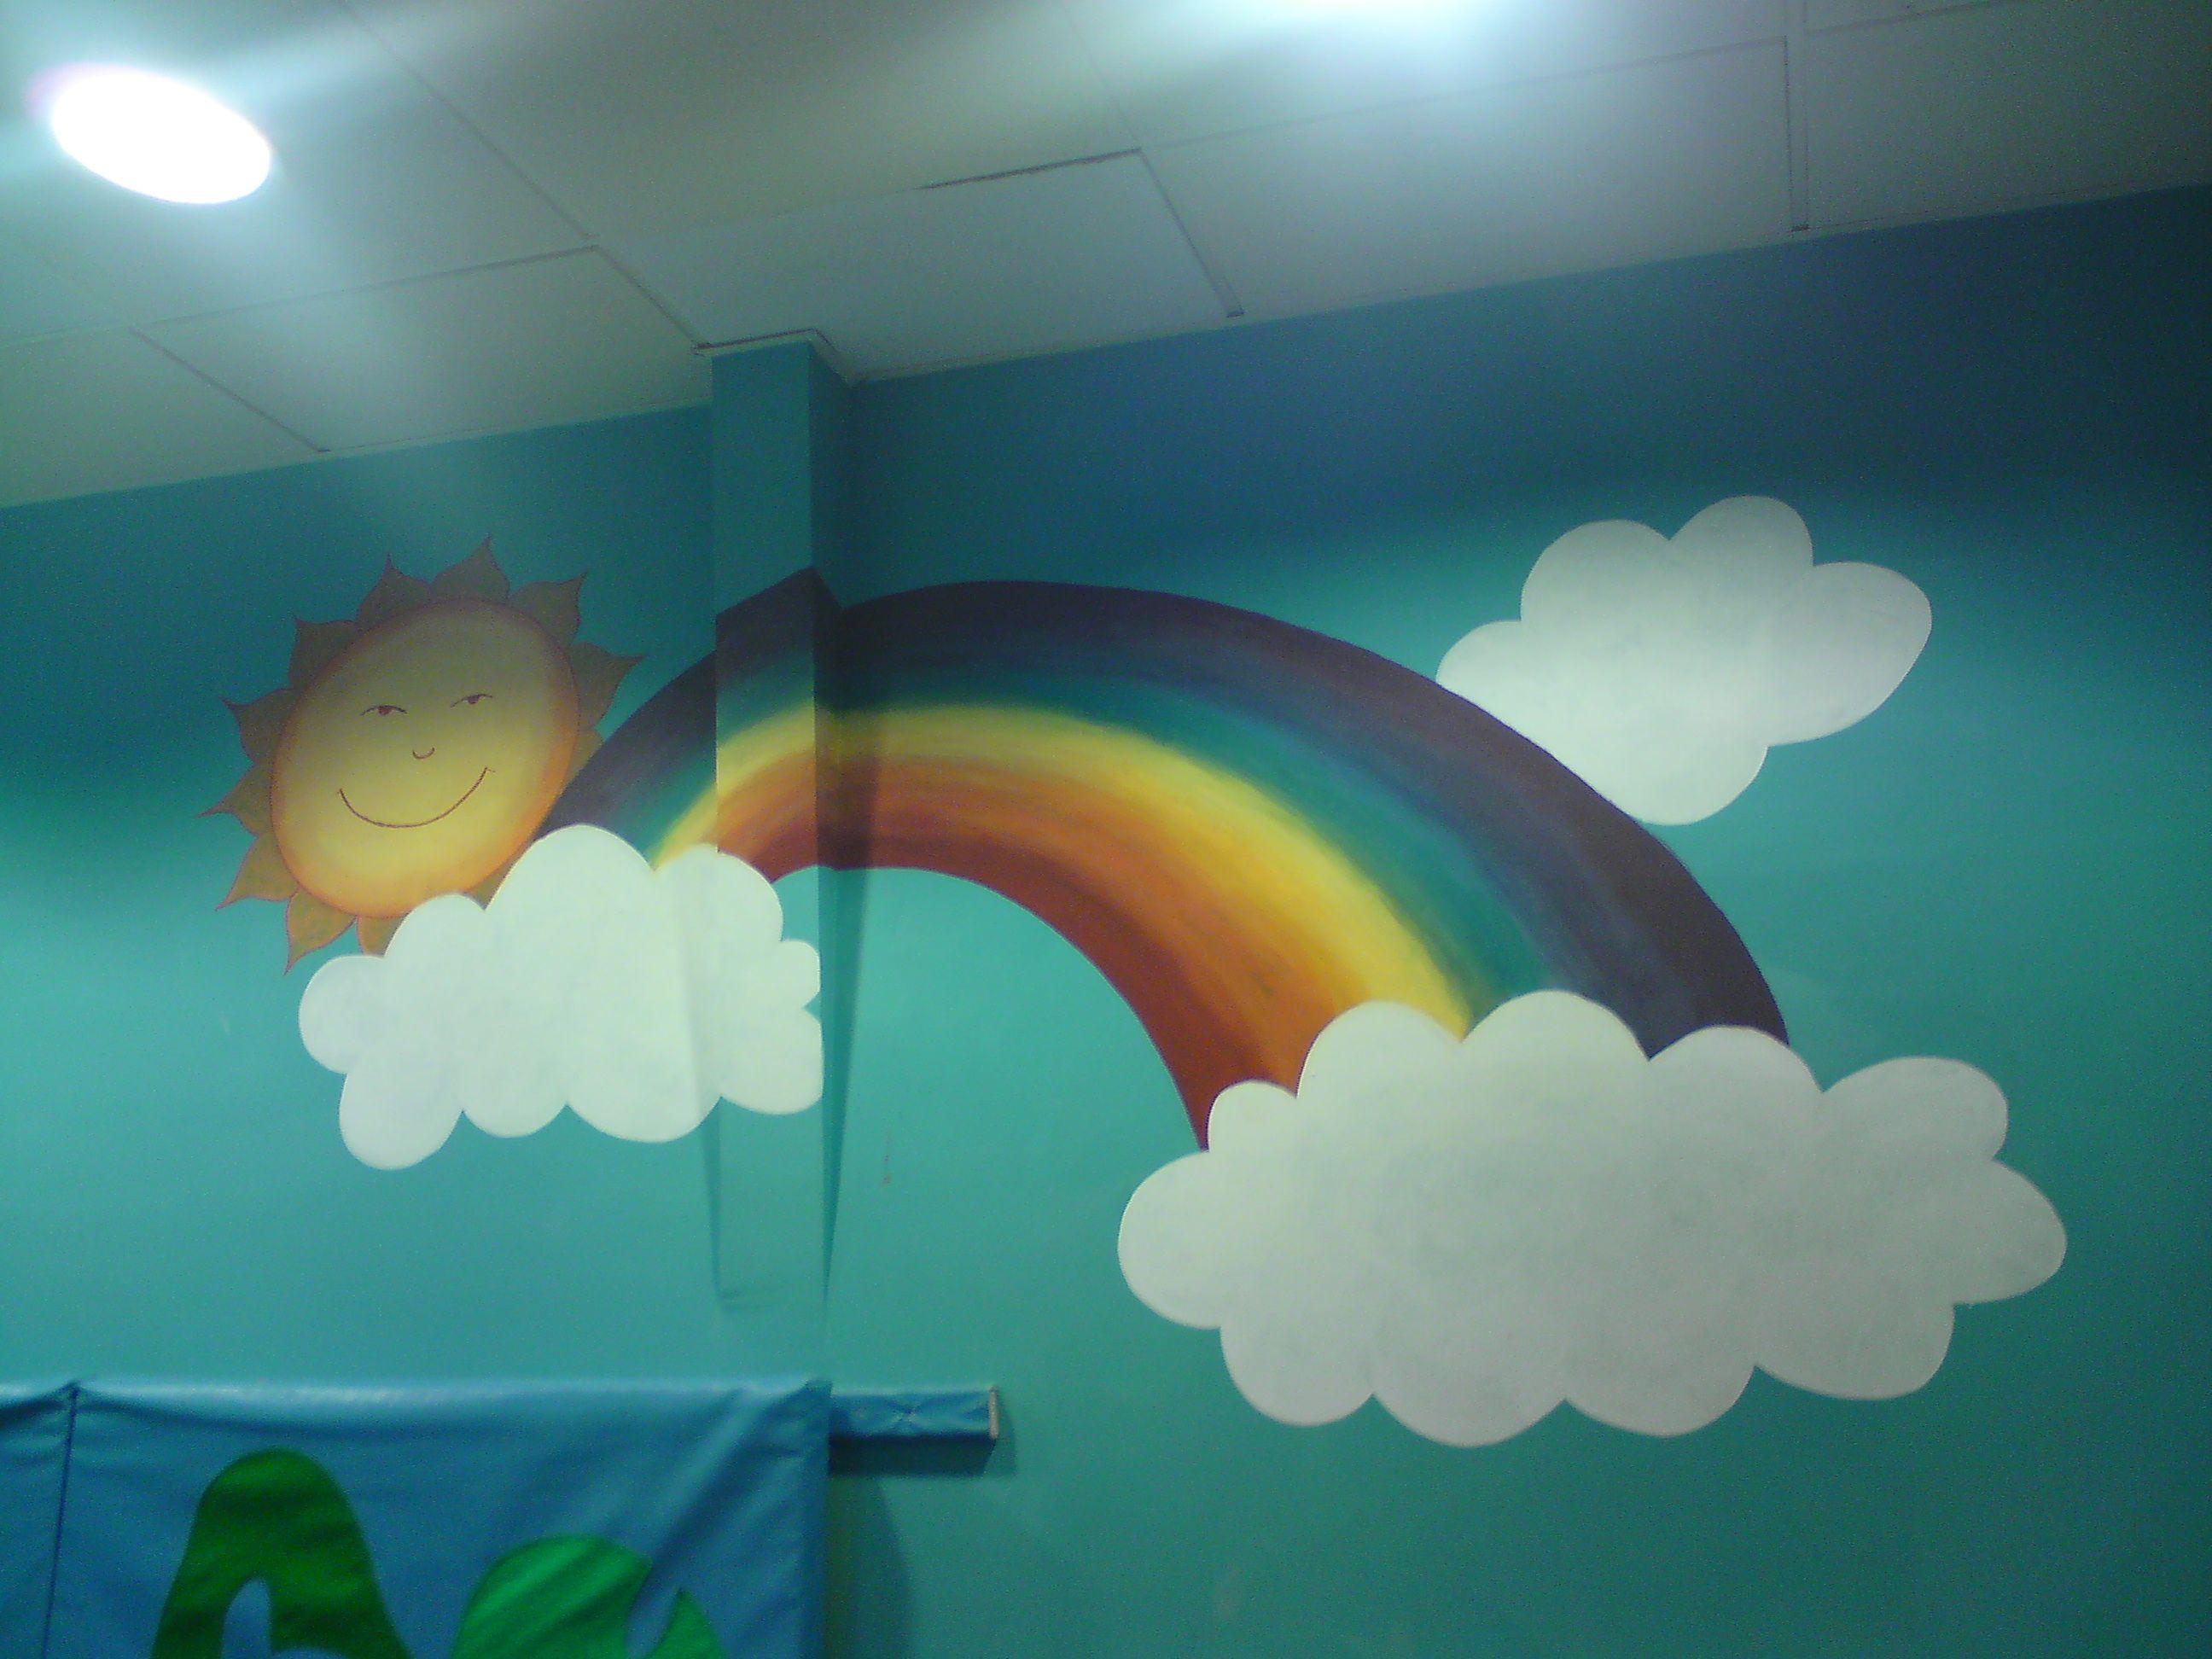 Playroom Paint Kid Ideas Bedroom Kids Room Stuff Girl Rooms Playrooms Art Paintings Children S